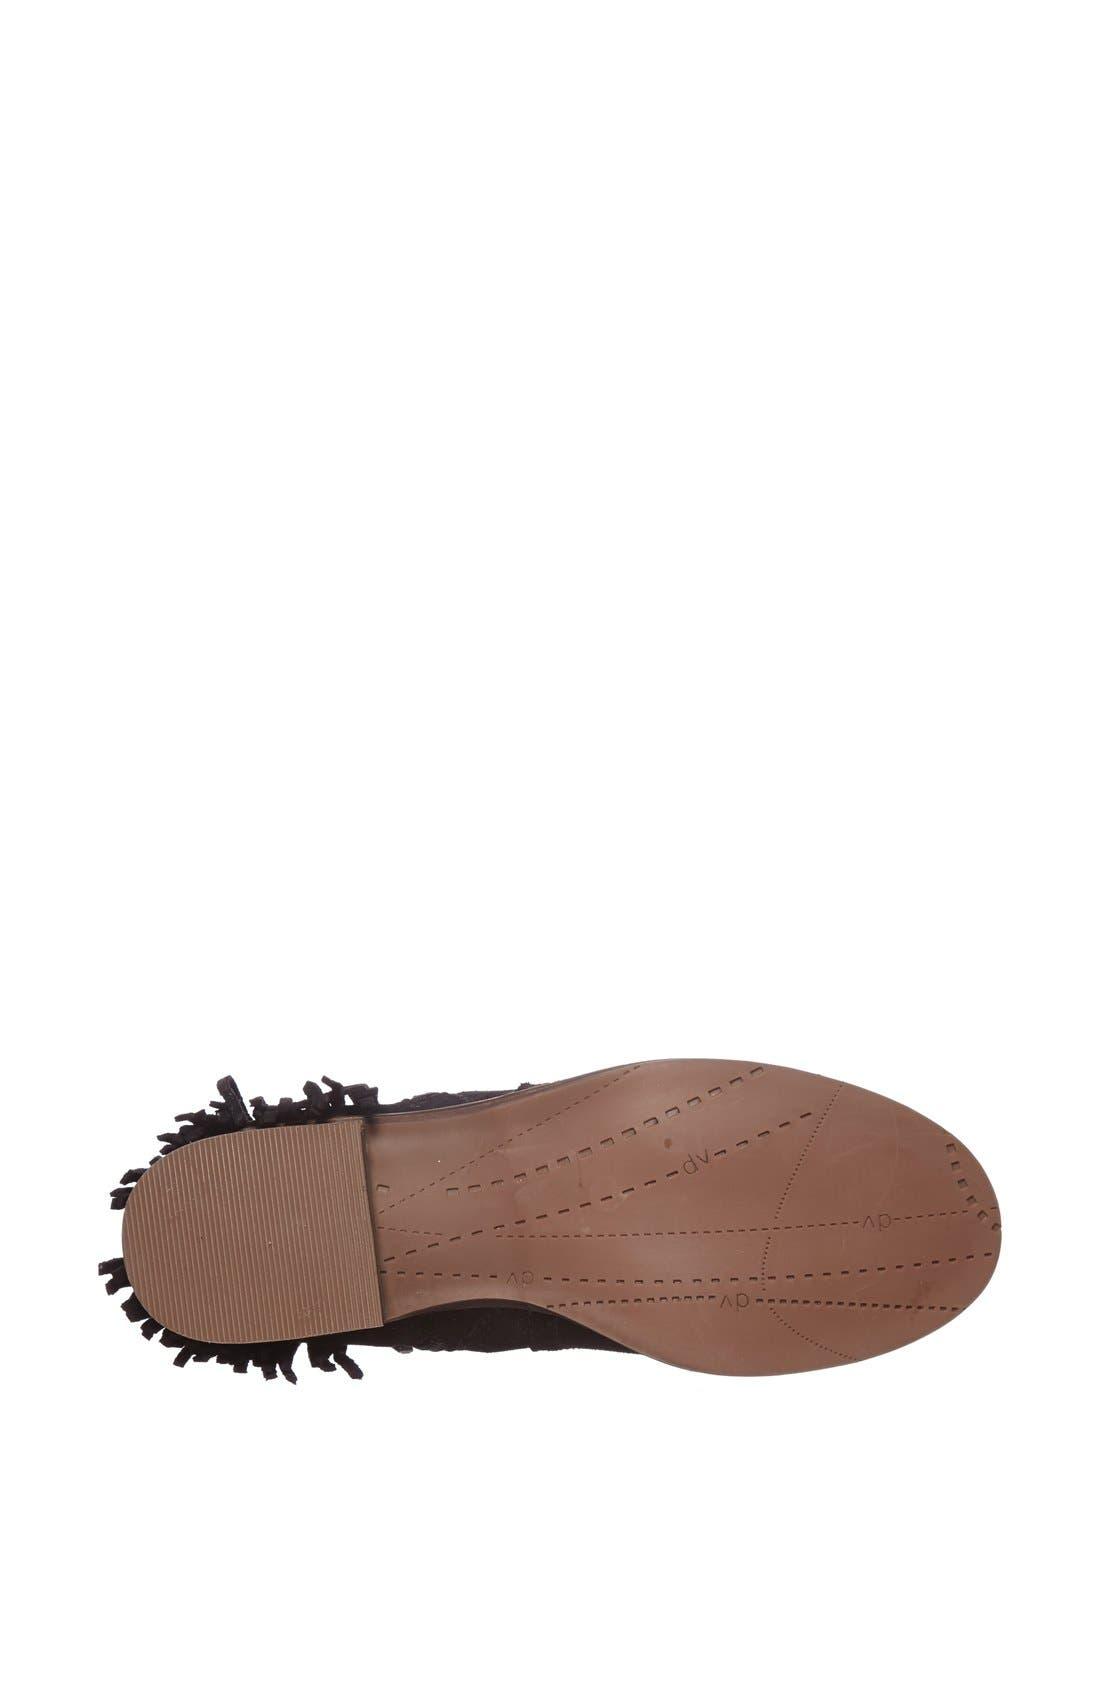 DV Footwear 'Fisher' Bootie,                             Alternate thumbnail 3, color,                             004